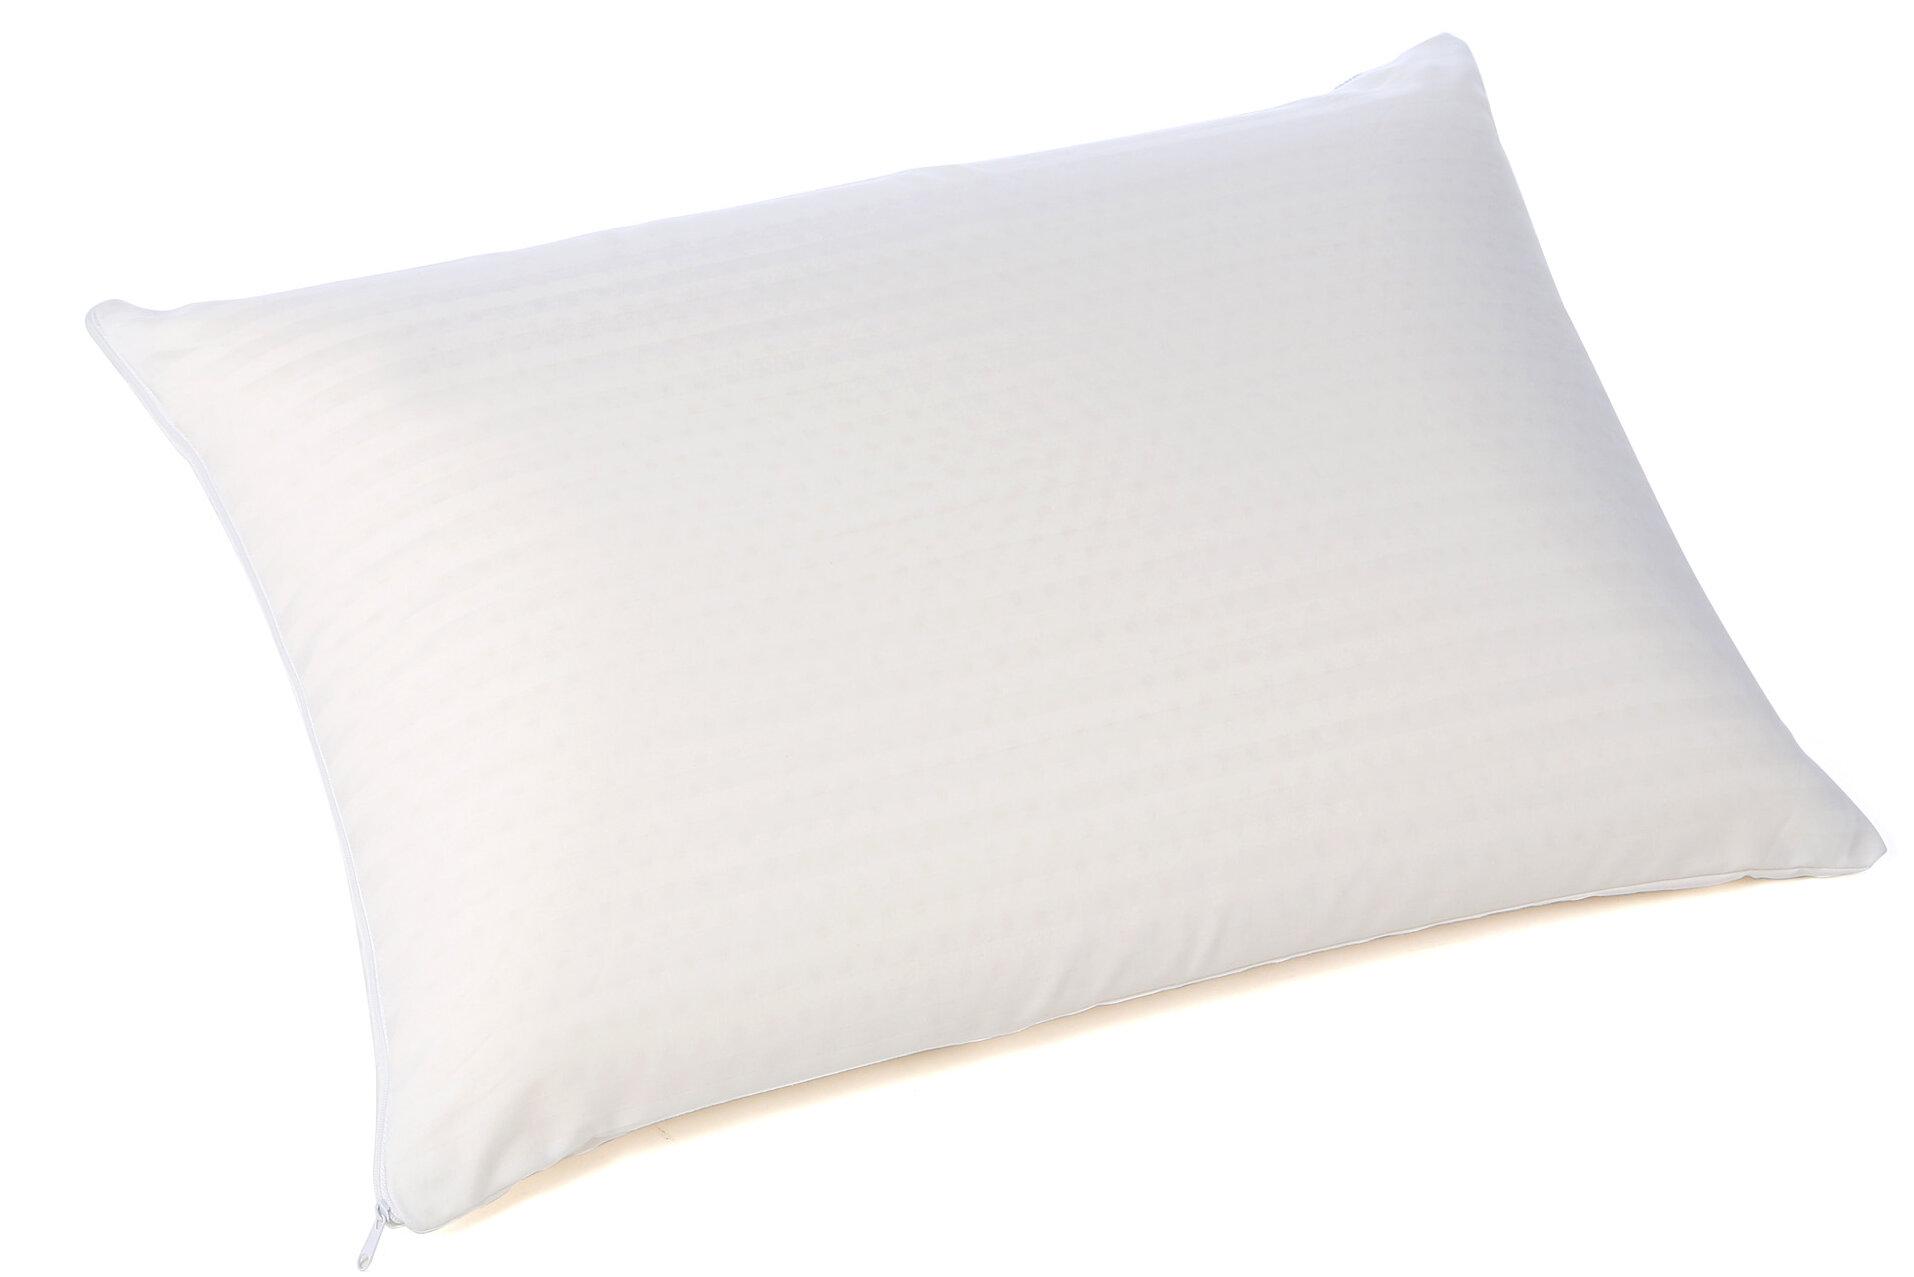 feel latex tontine soft profile medium dunlopillo pillow luxurious talalay